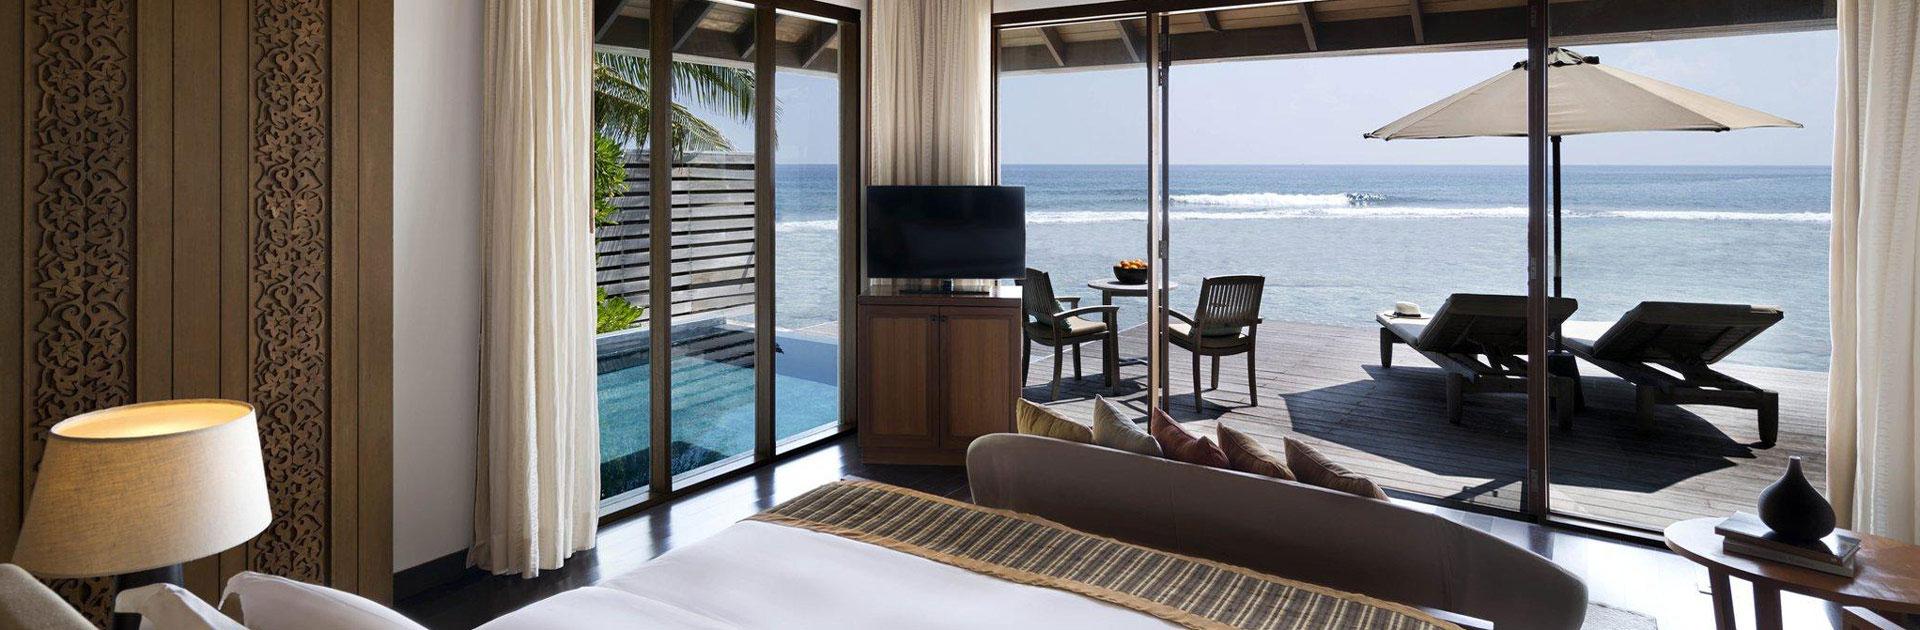 MV Anantara Veri Resort and Spa 9 días 3